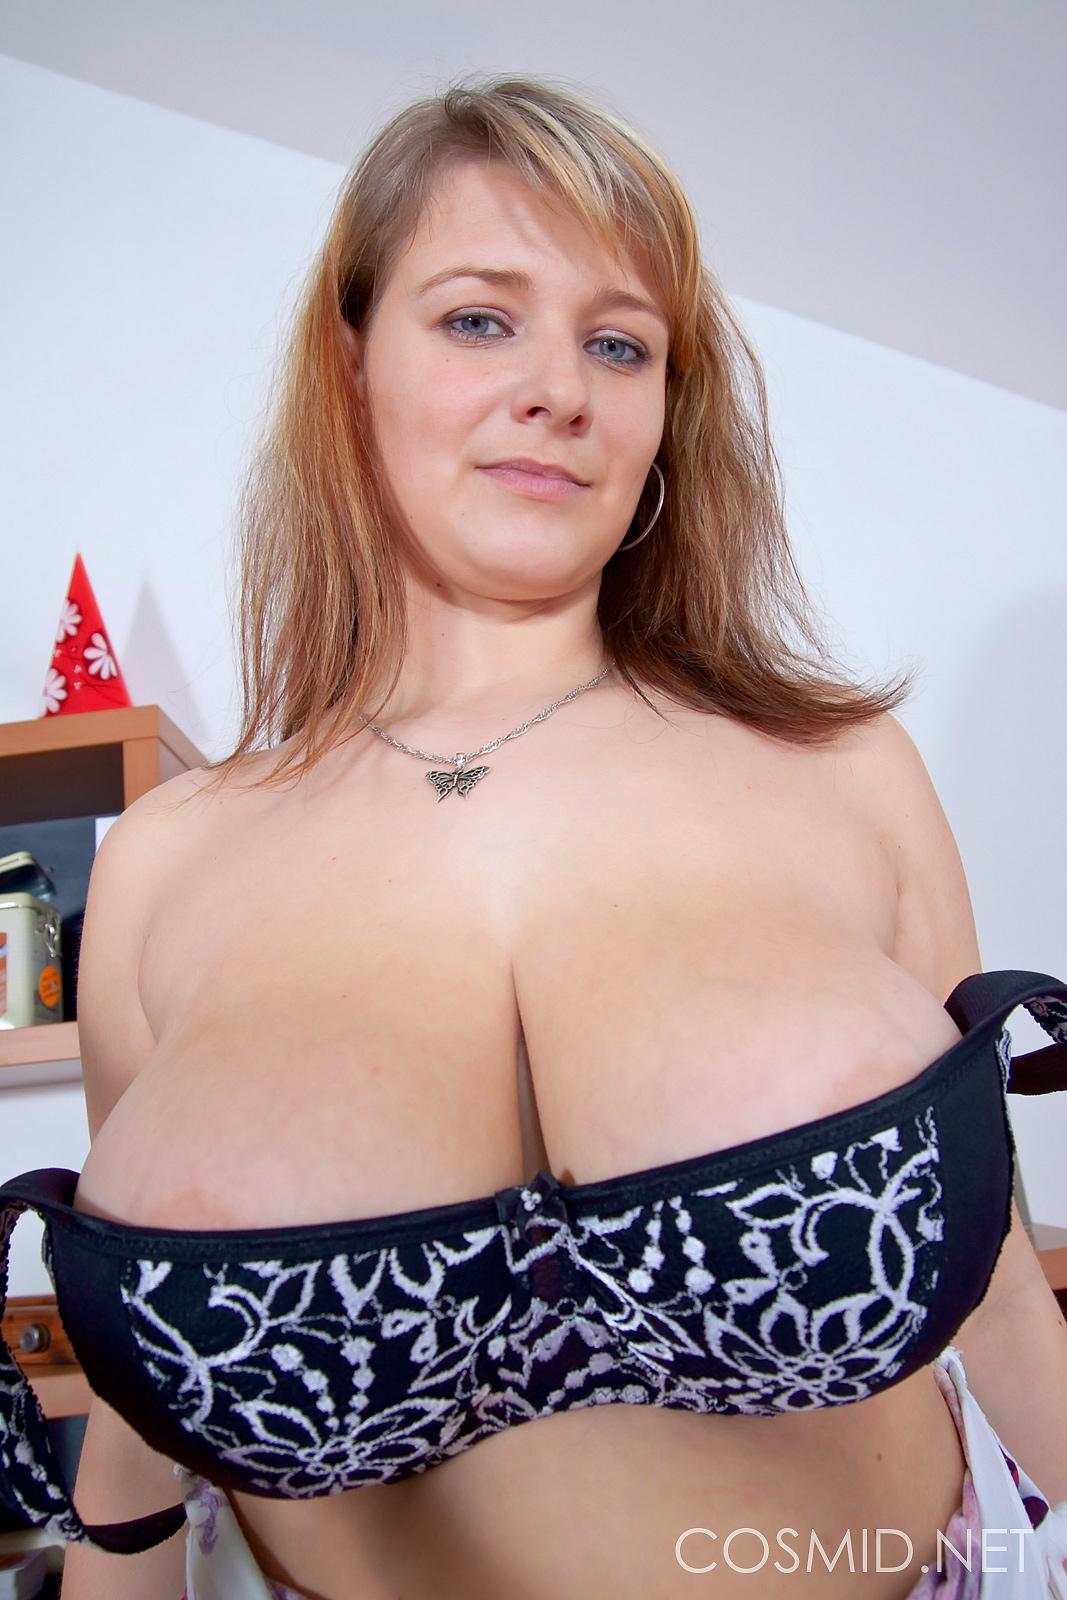 Jane cosmid big tits naked